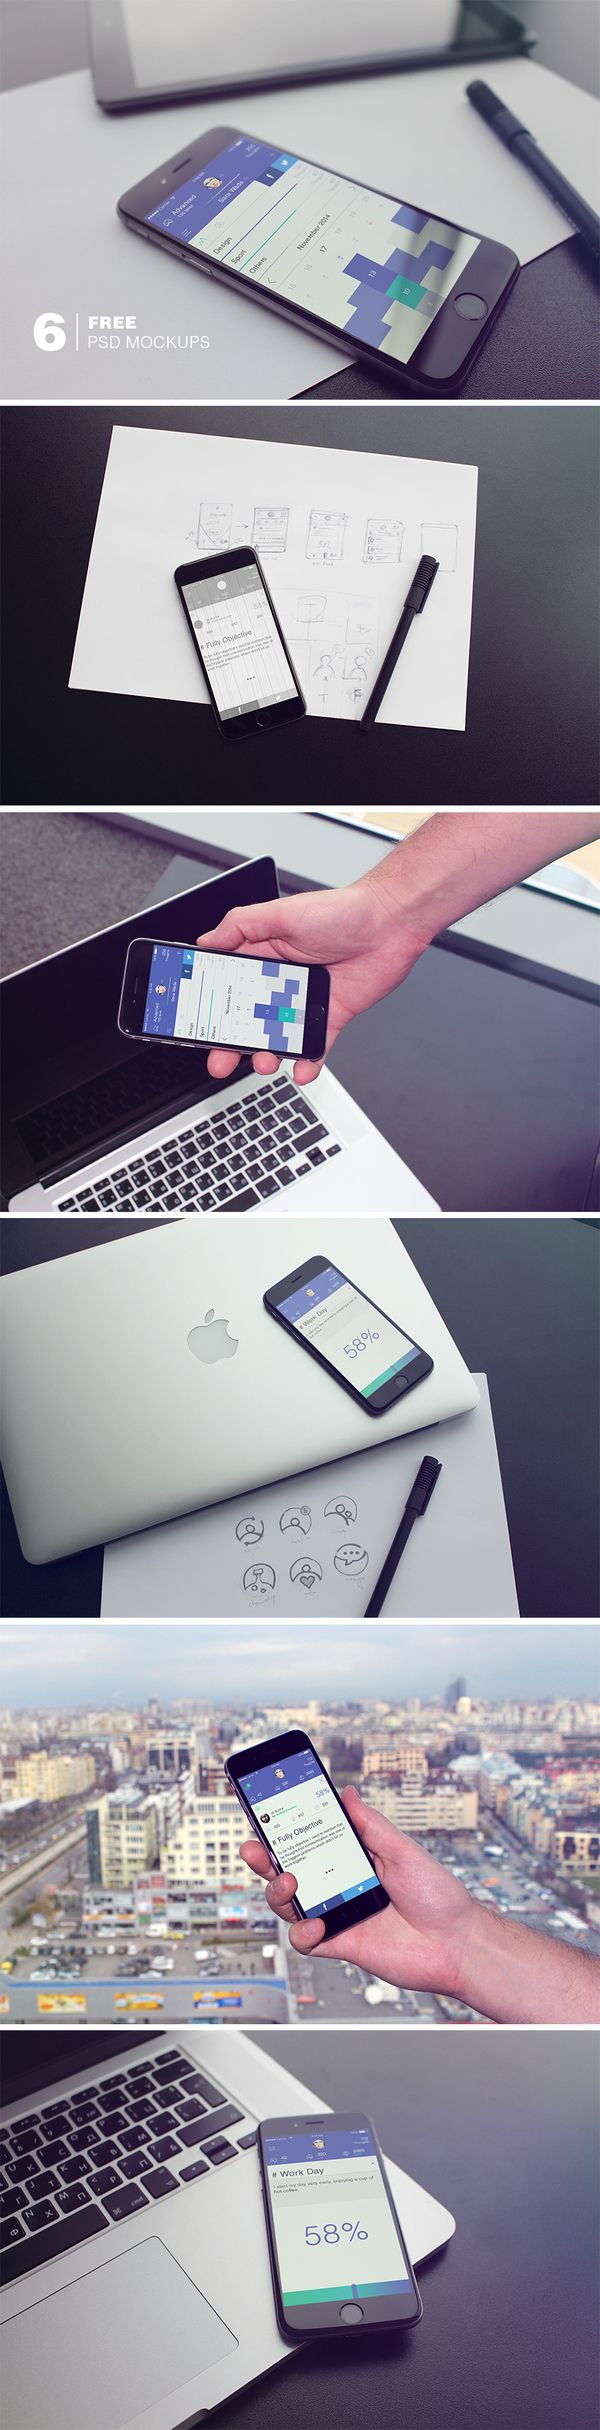 df14a63ae7117e0f8f93d1f8b23ed7e8 mock up free iphone